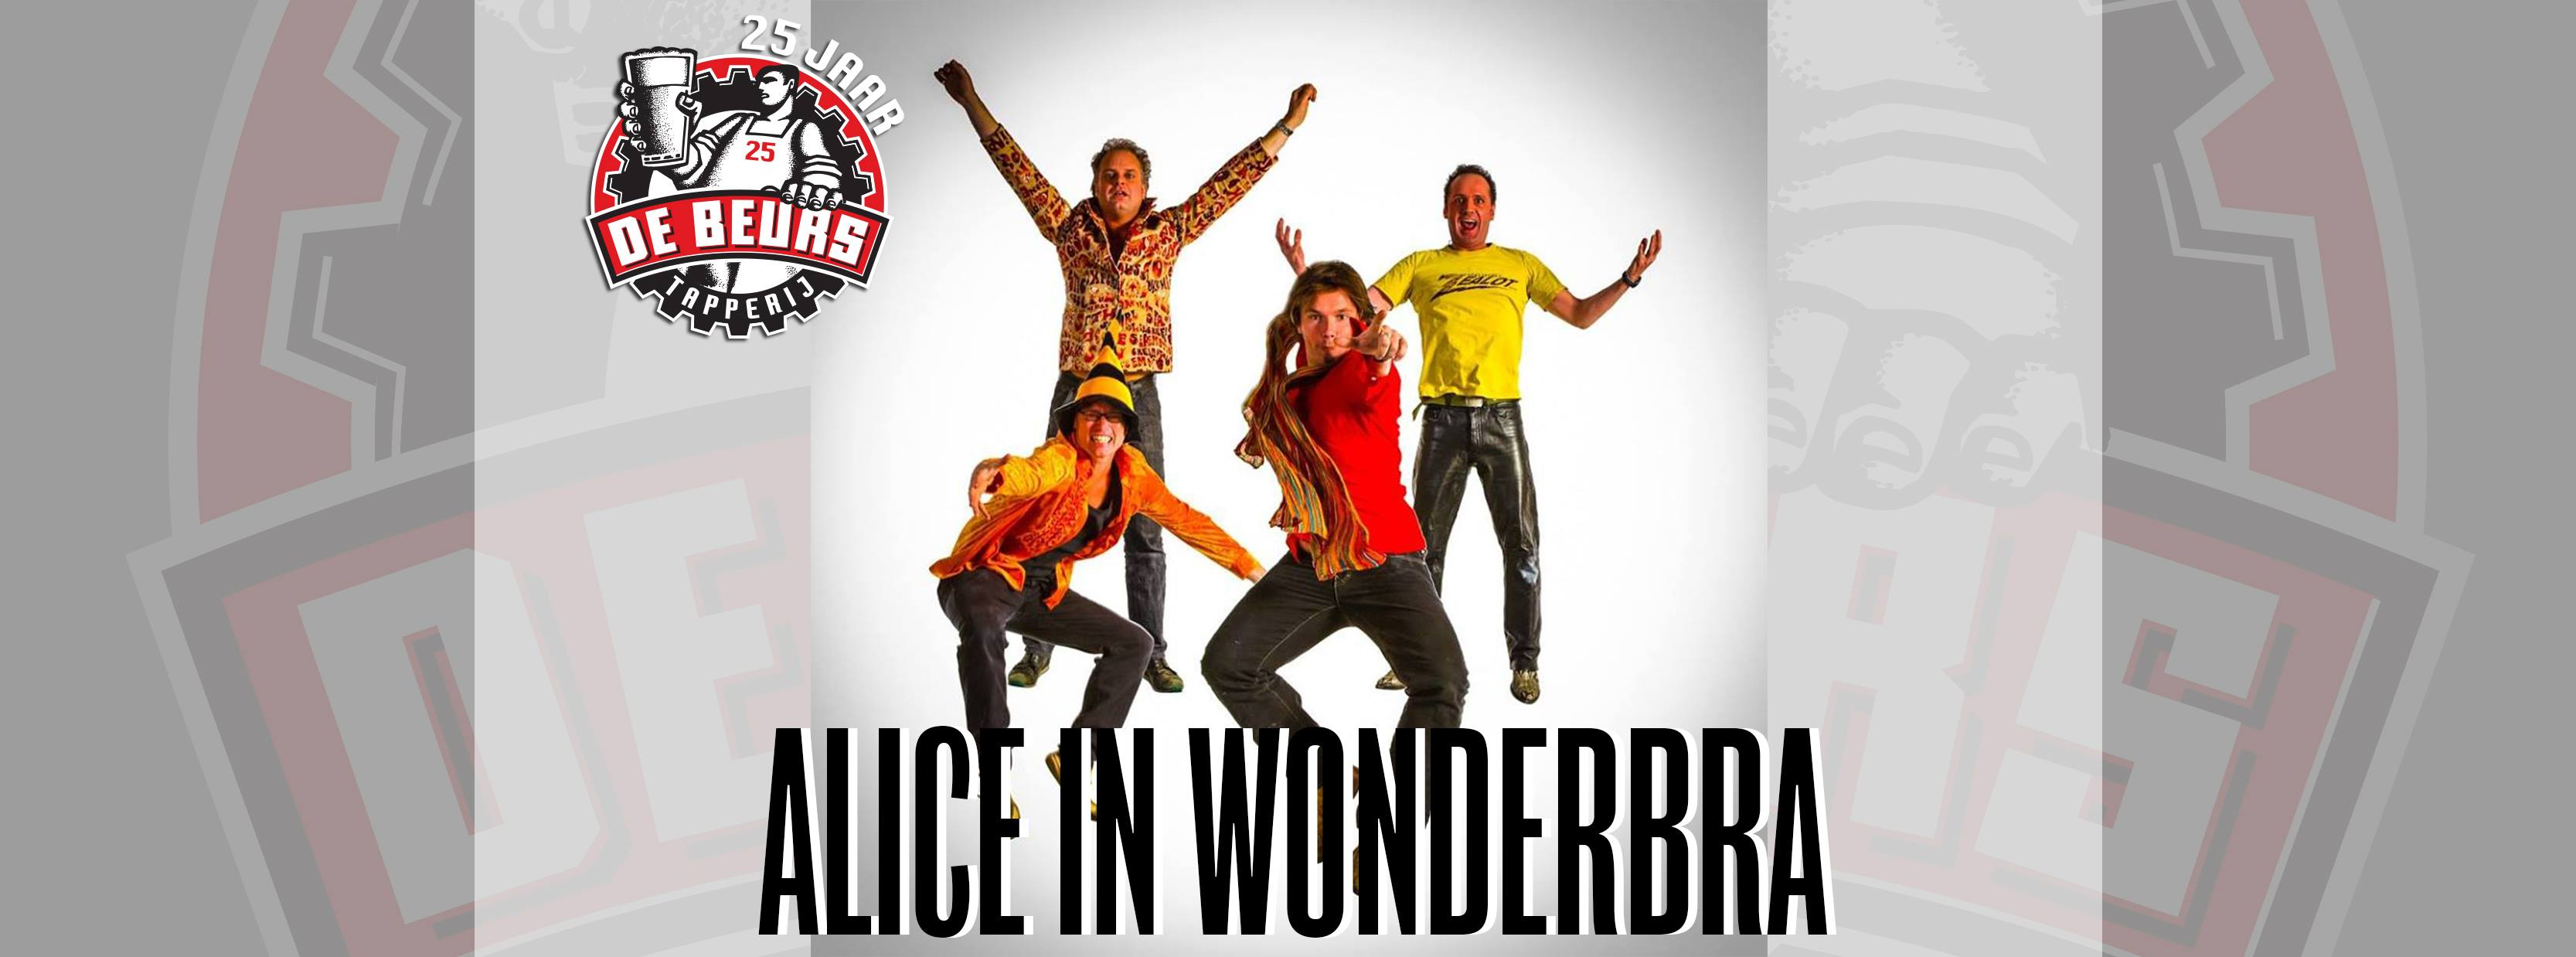 City Theater, Alice in Wonderbra